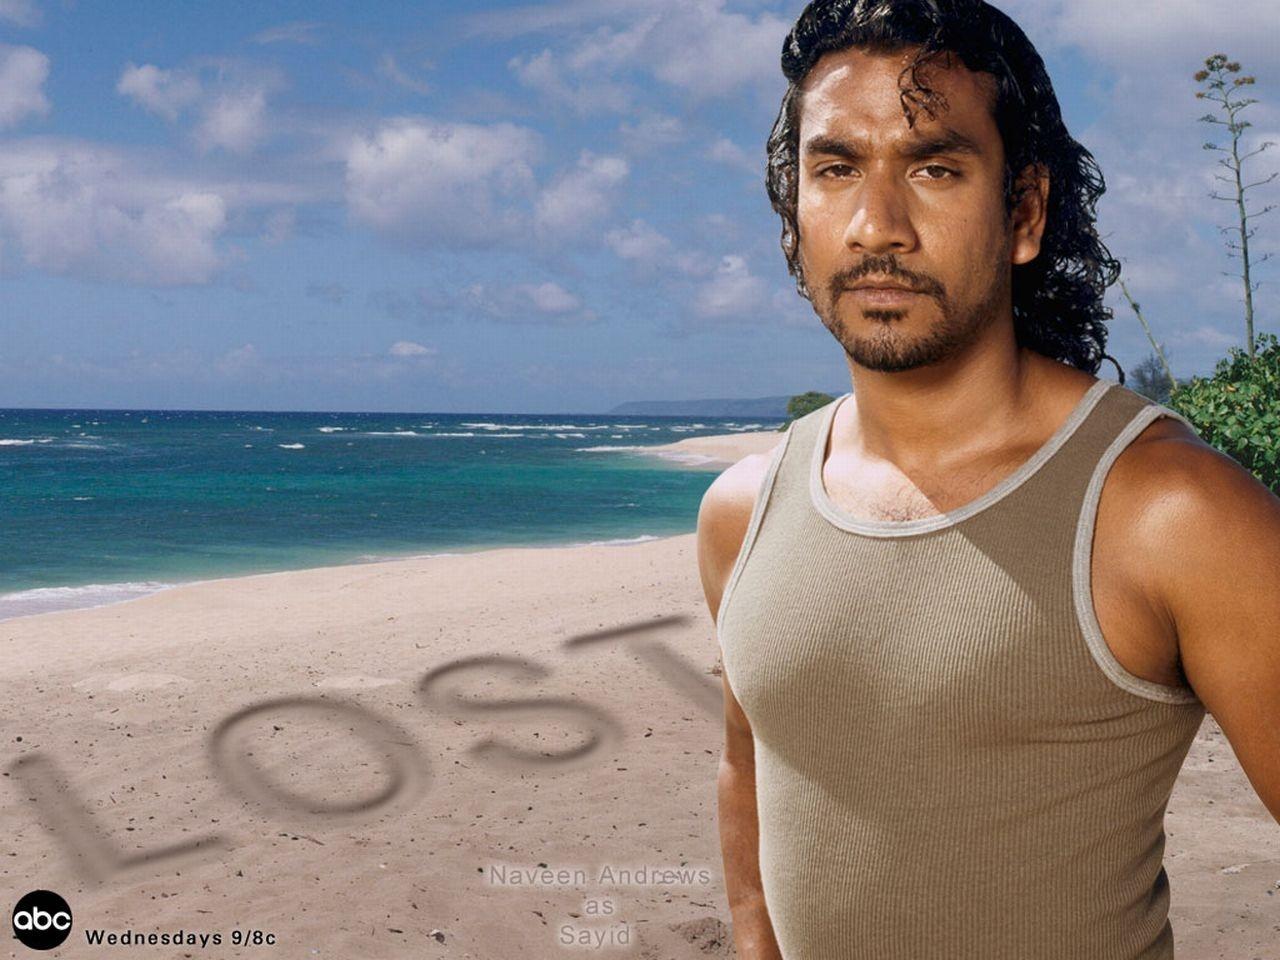 Wallpaper della serie Lost con Naveen Andrews